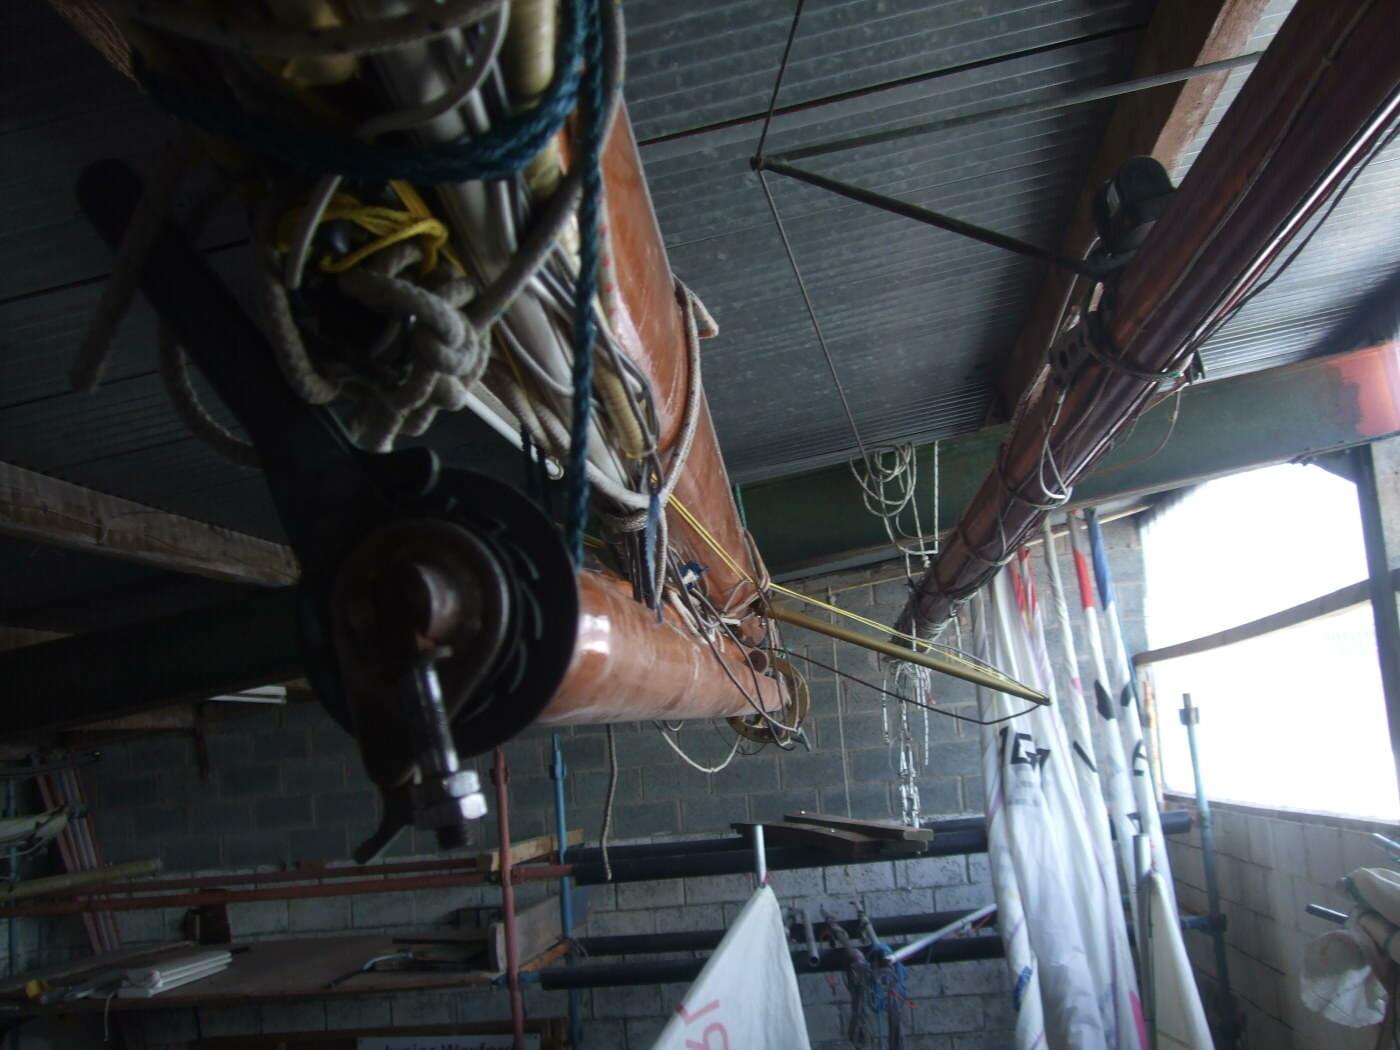 Mast, spinnaker pole & boom